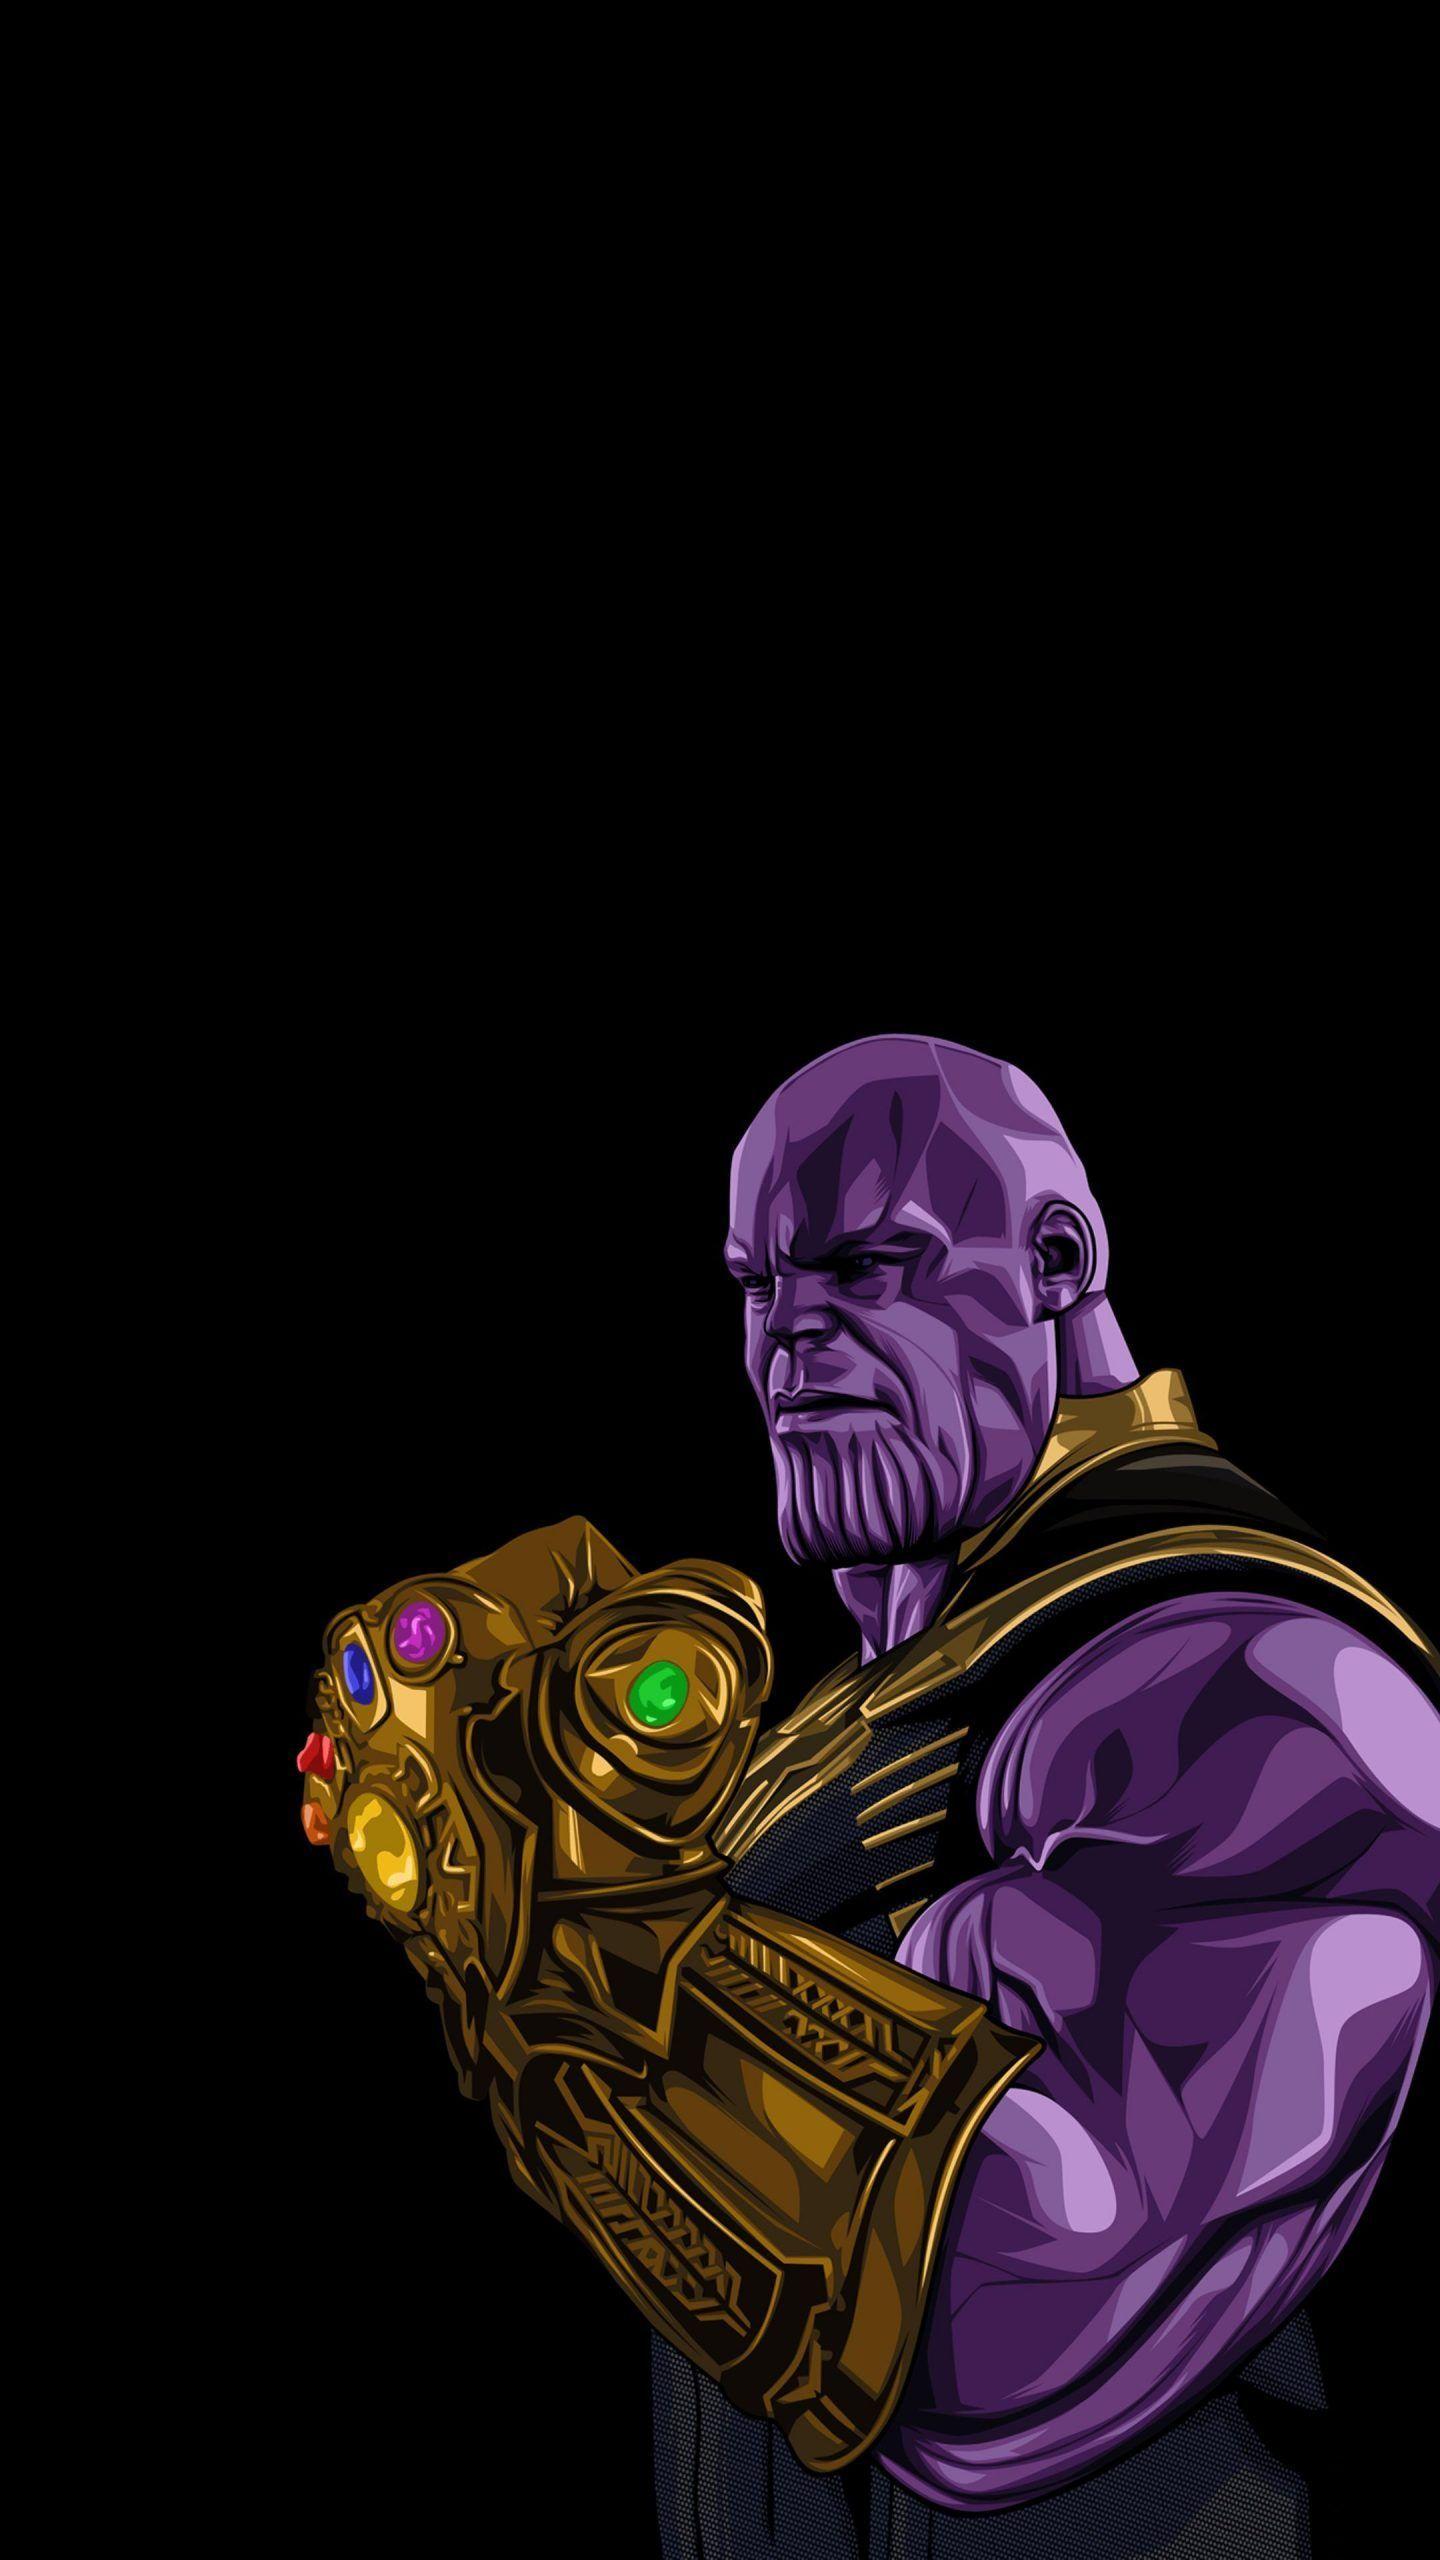 Thanos 4K Wallpaper 2160X3840